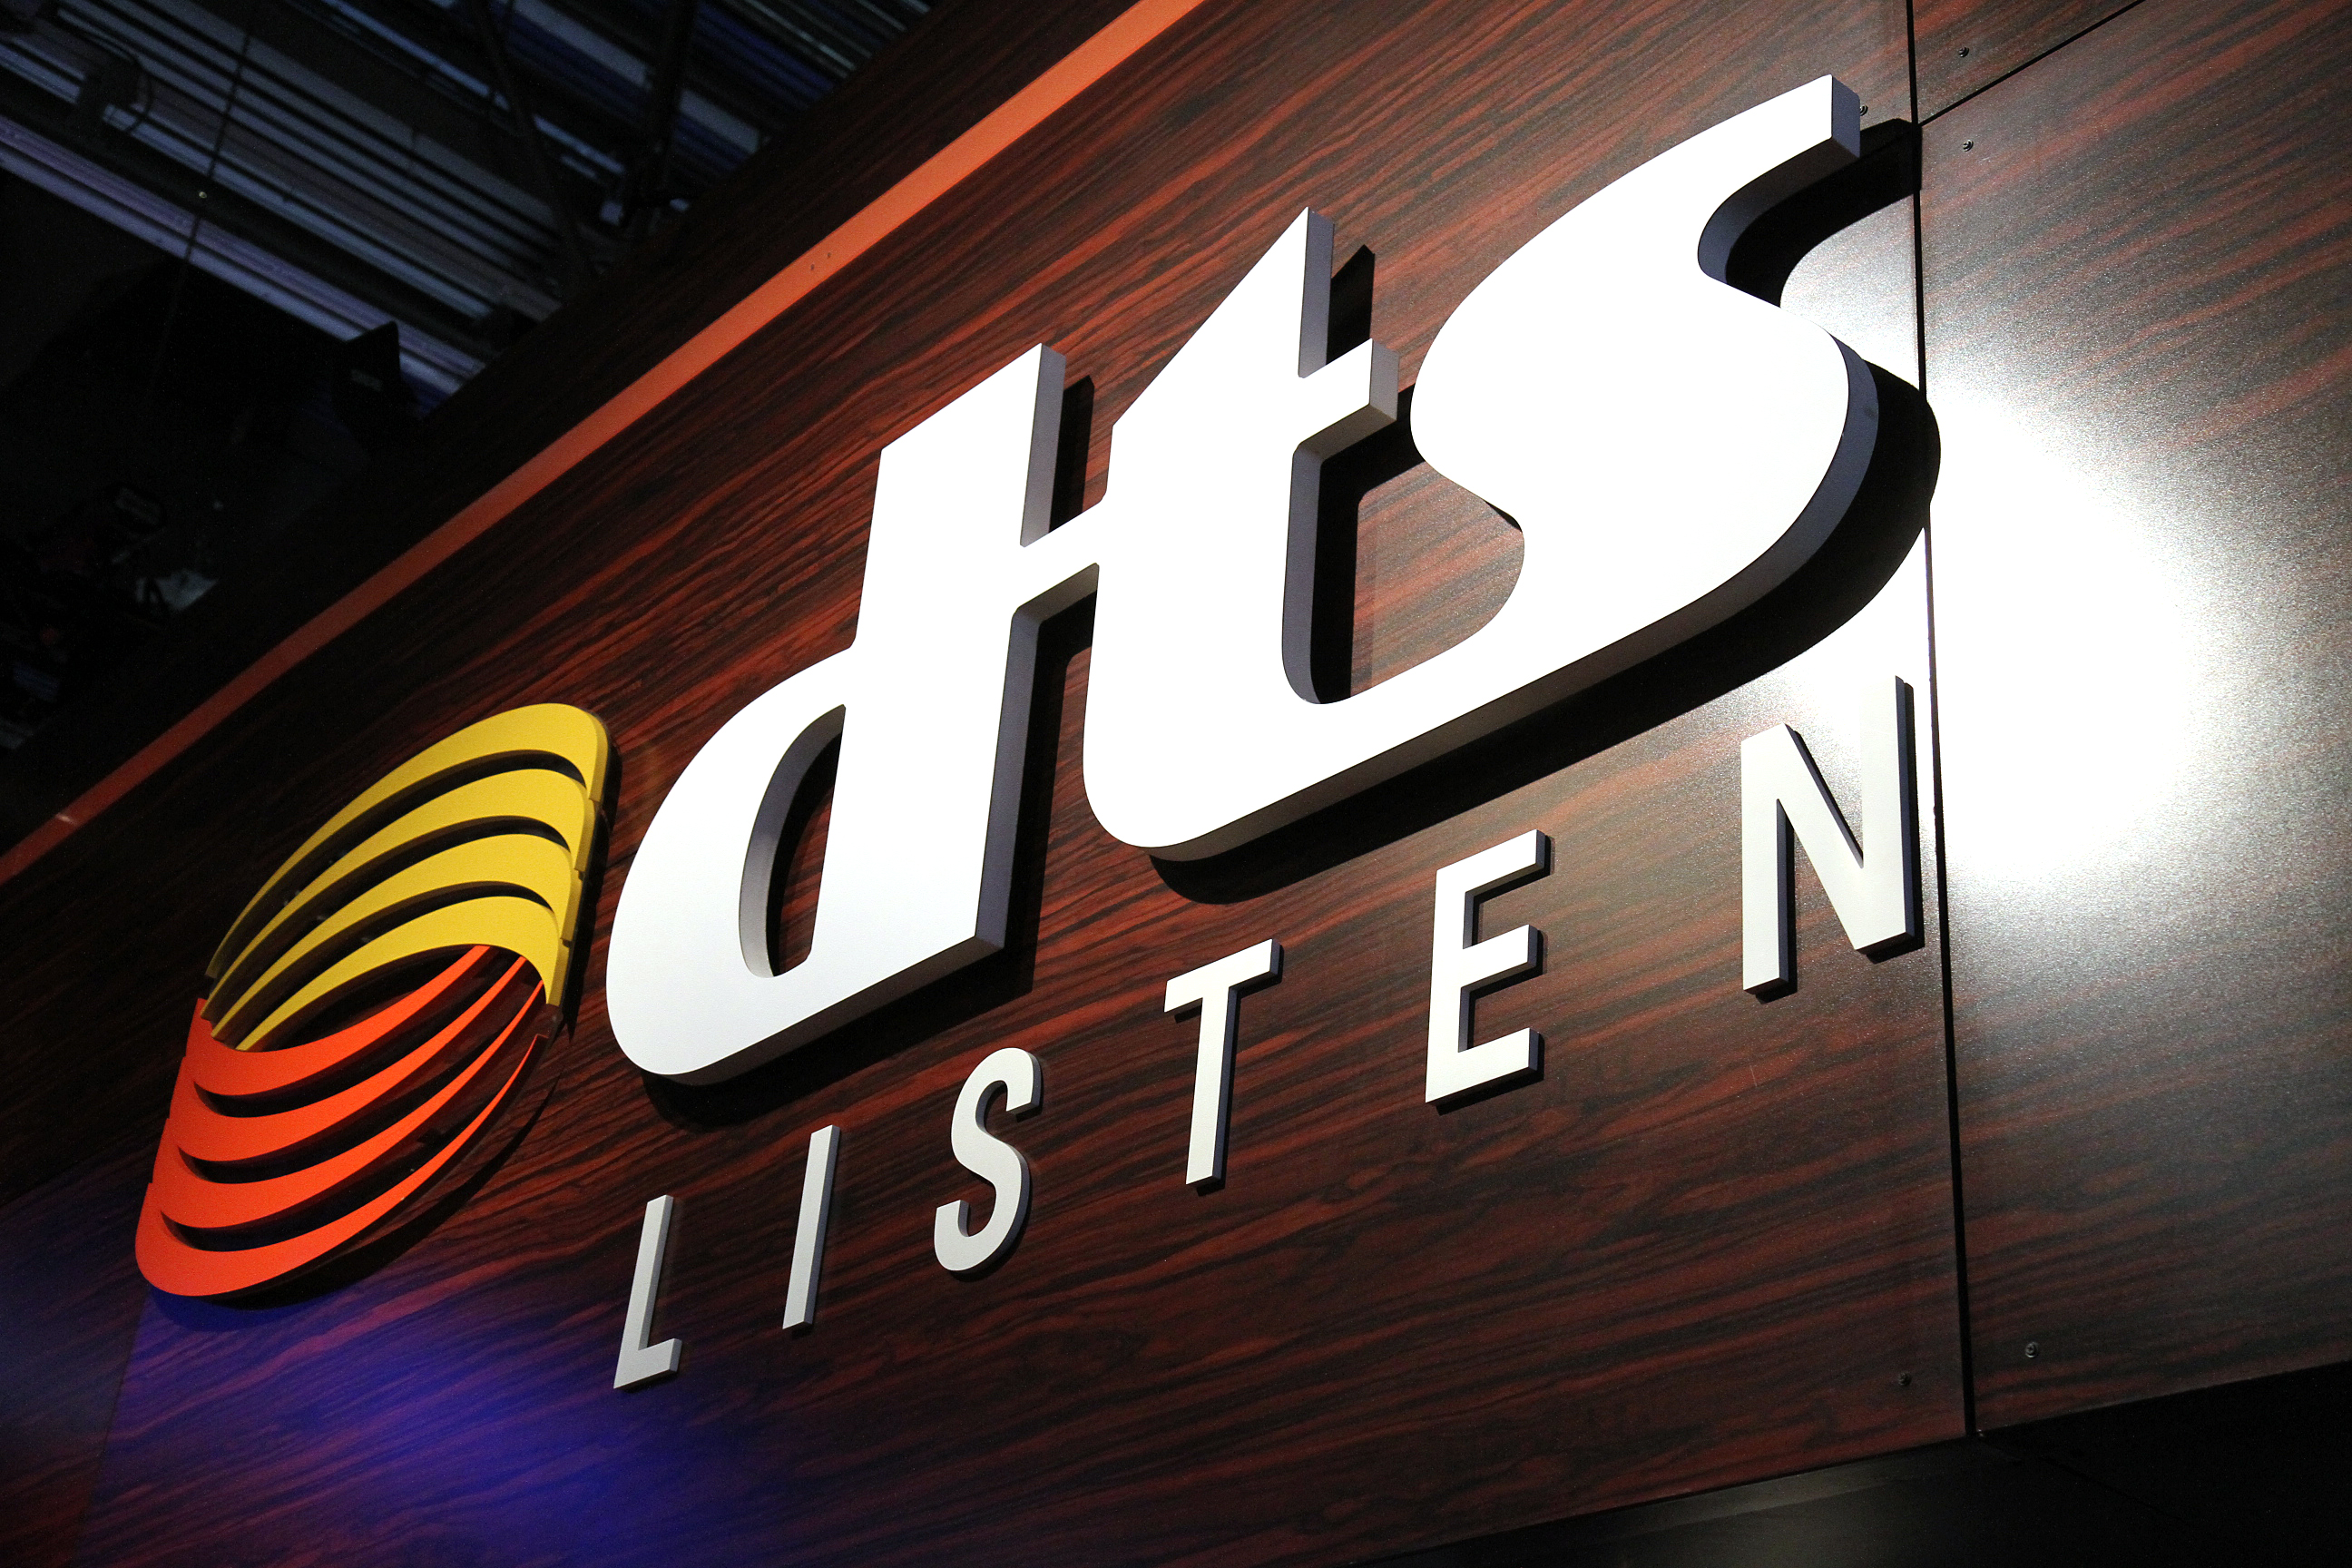 DTS Headphone:X Technology | david susilo UNCENSORED